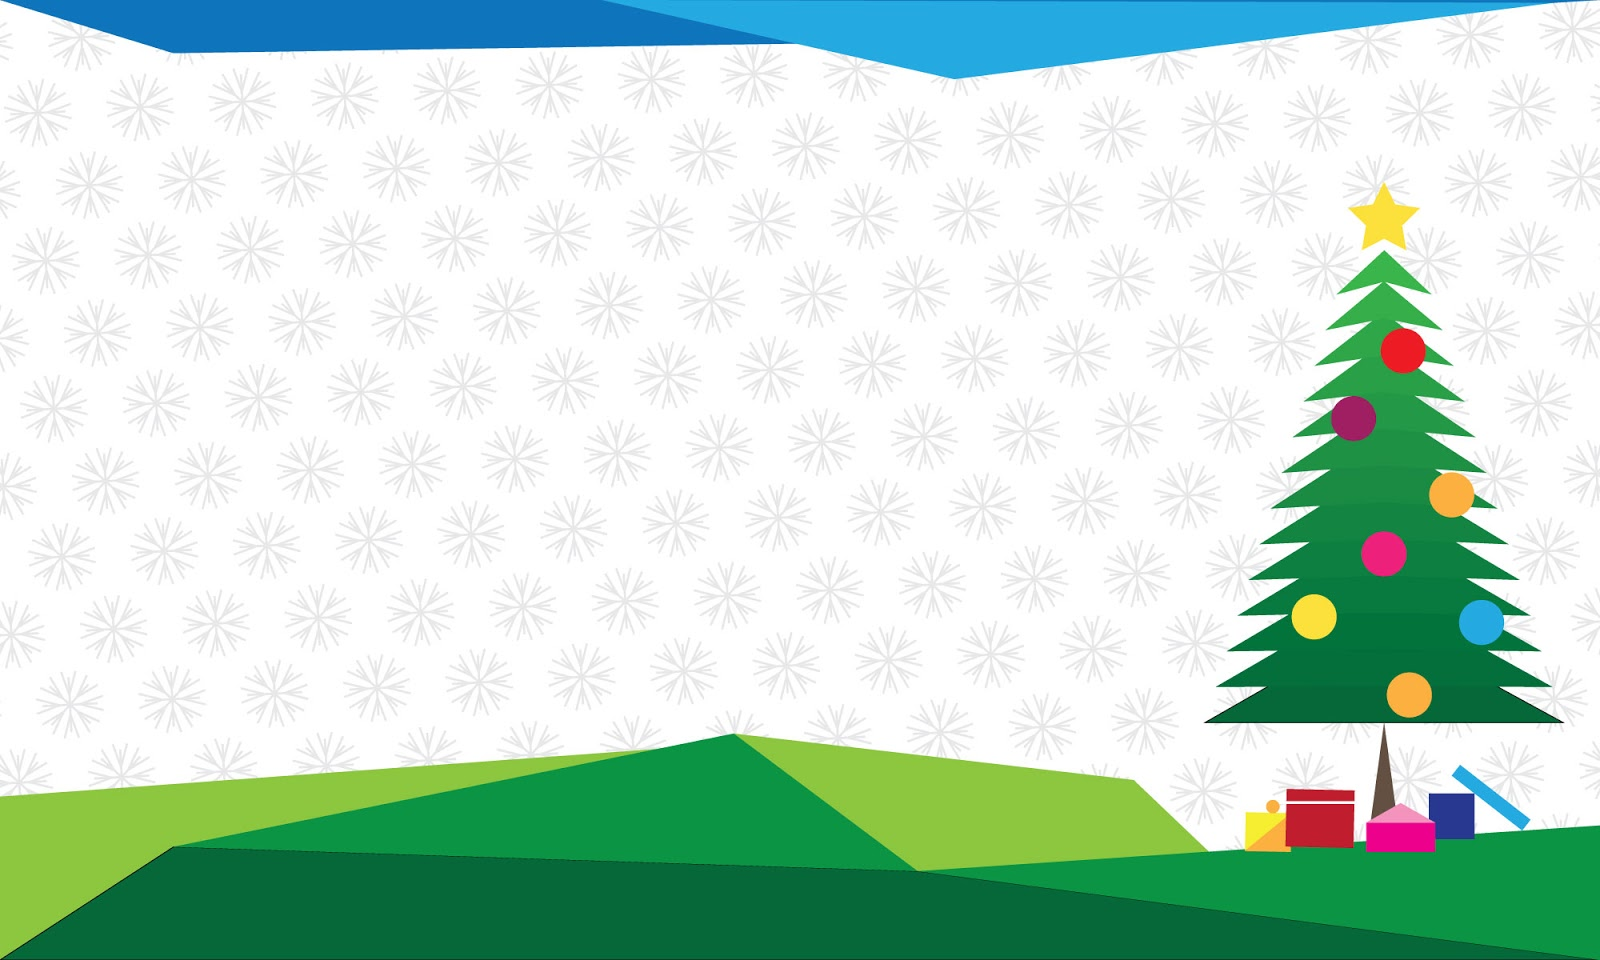 Kumpulan Background Kartu Ucapan Natal Keren - Mas Vian